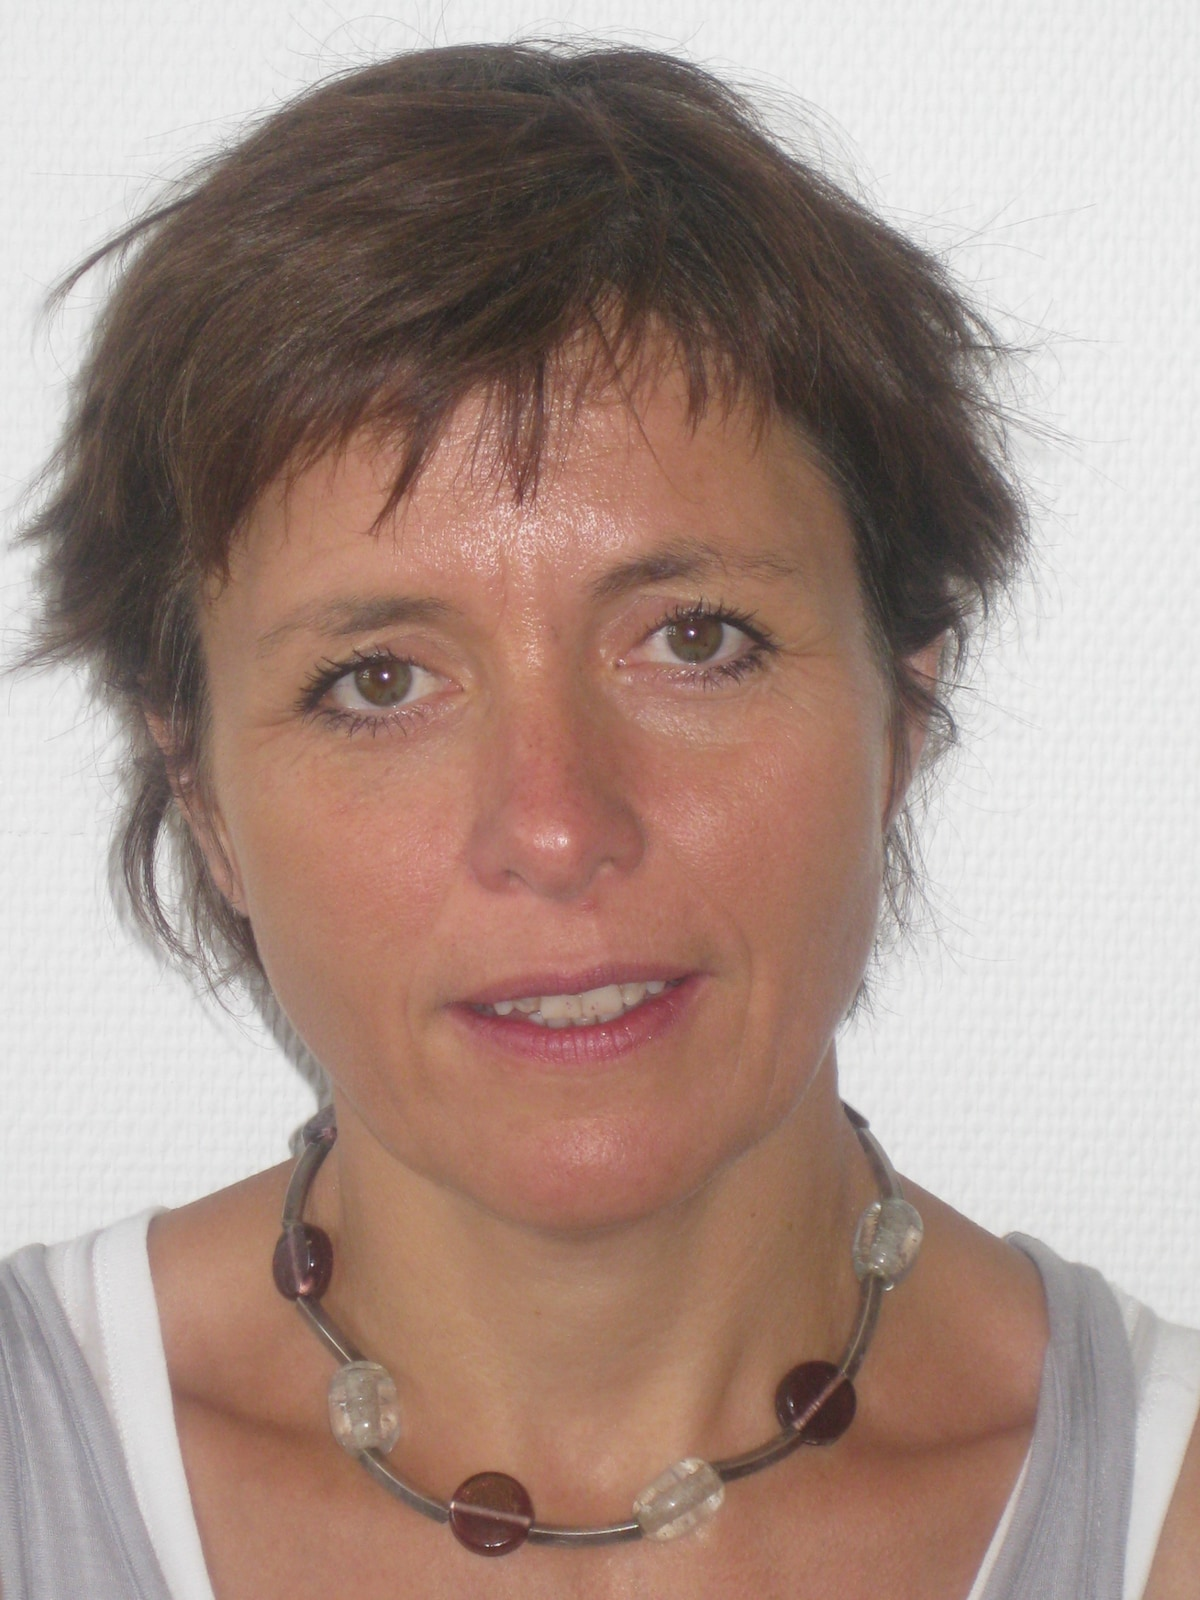 Sylvie de La Rochelle, France